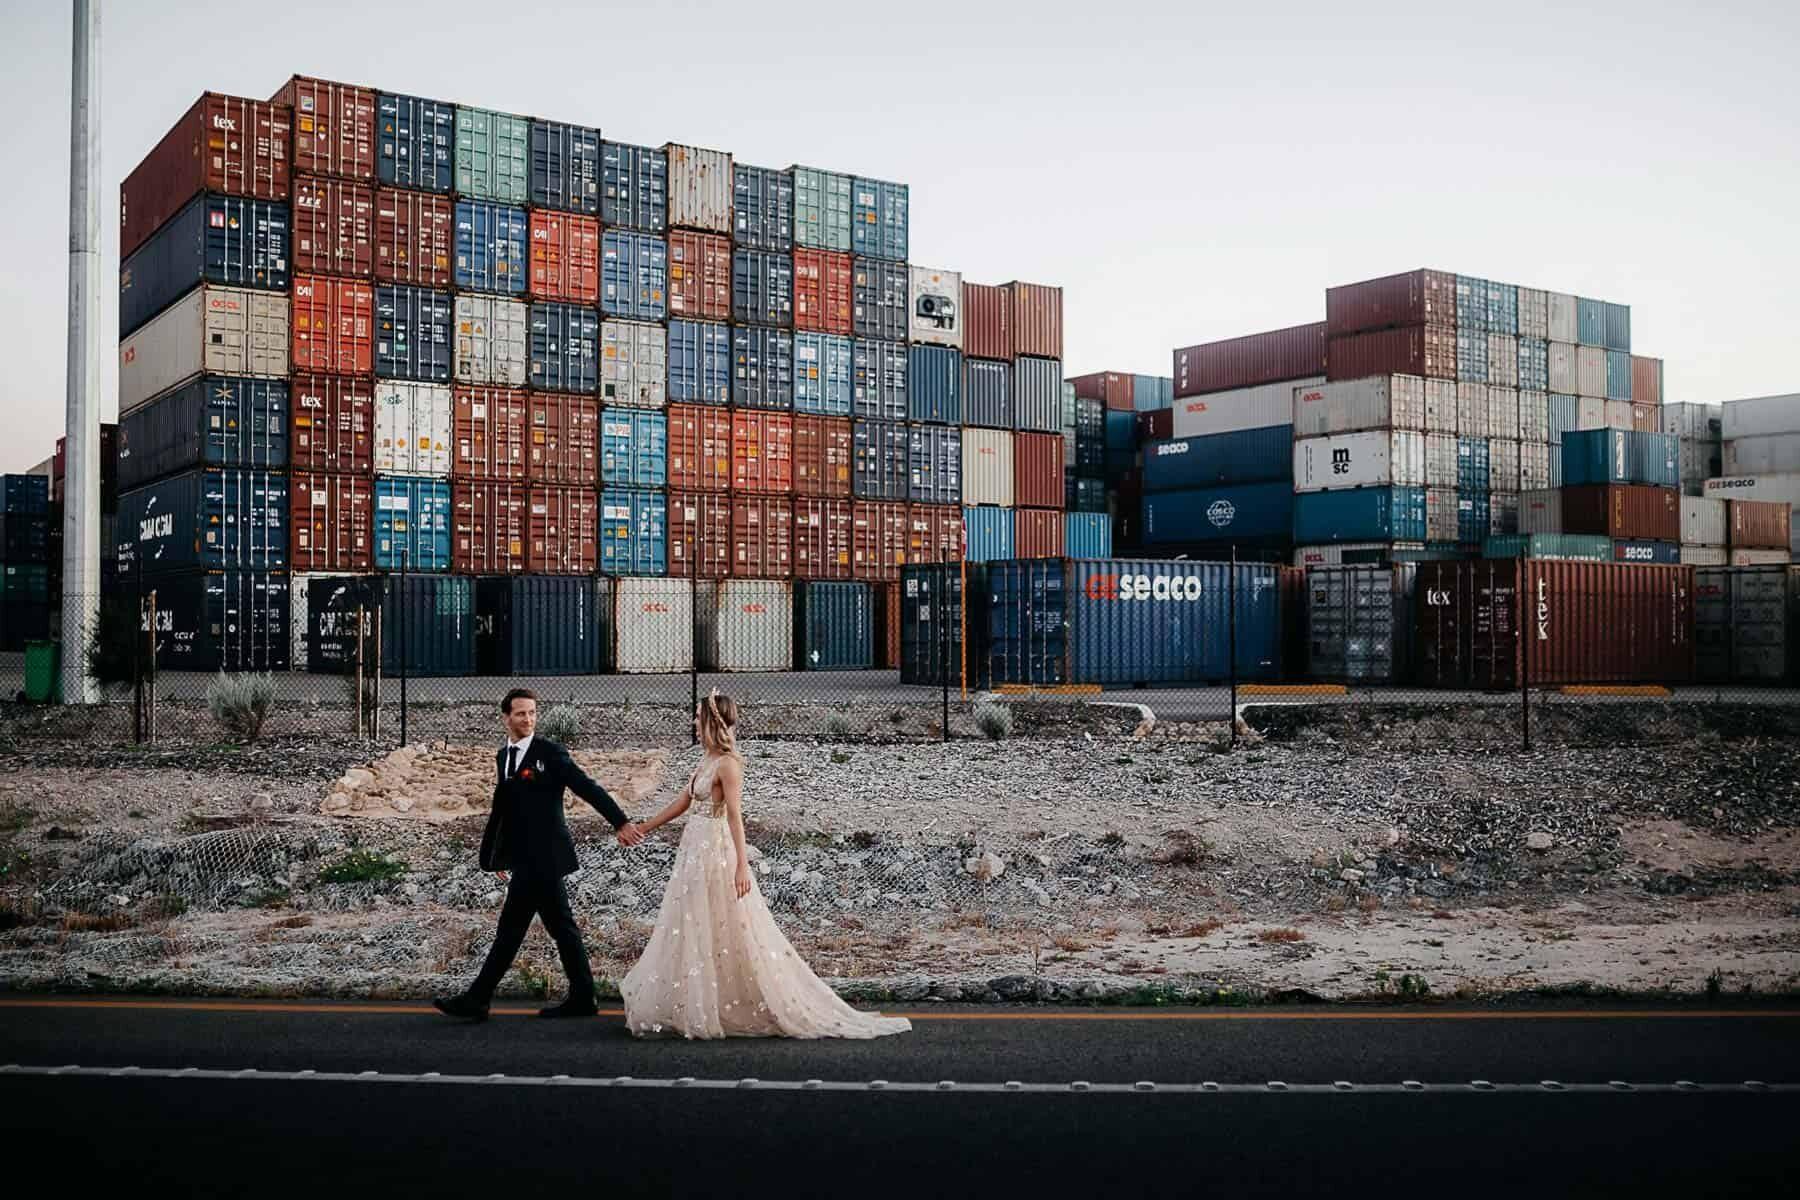 wedding photoshoot at Fremantle docksshot by Adam Levi Browne Photography